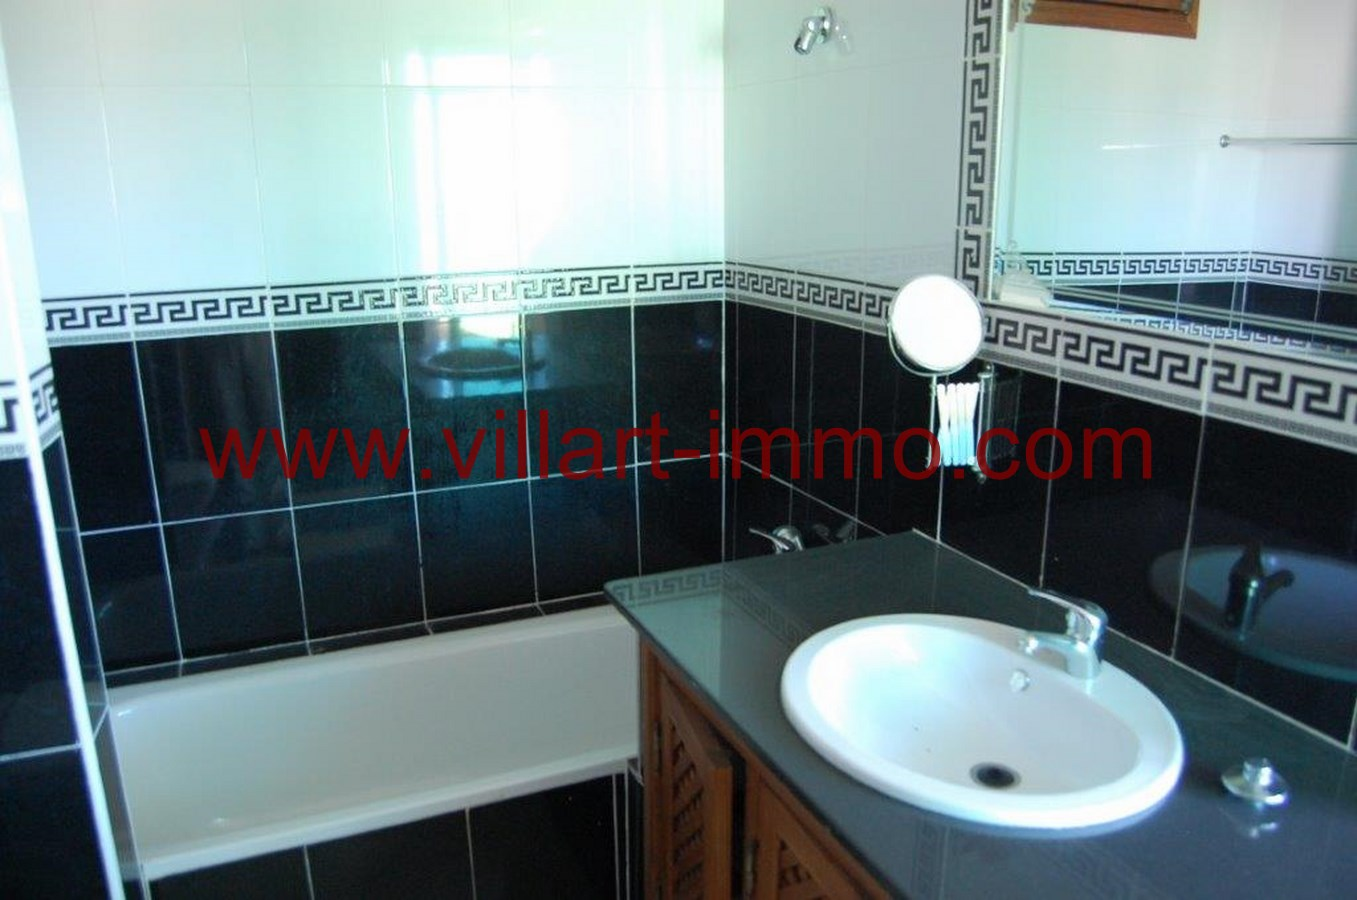 9-Location-Appartement-Non meublé-Tanger-Salle de bain-L718-Villart immo